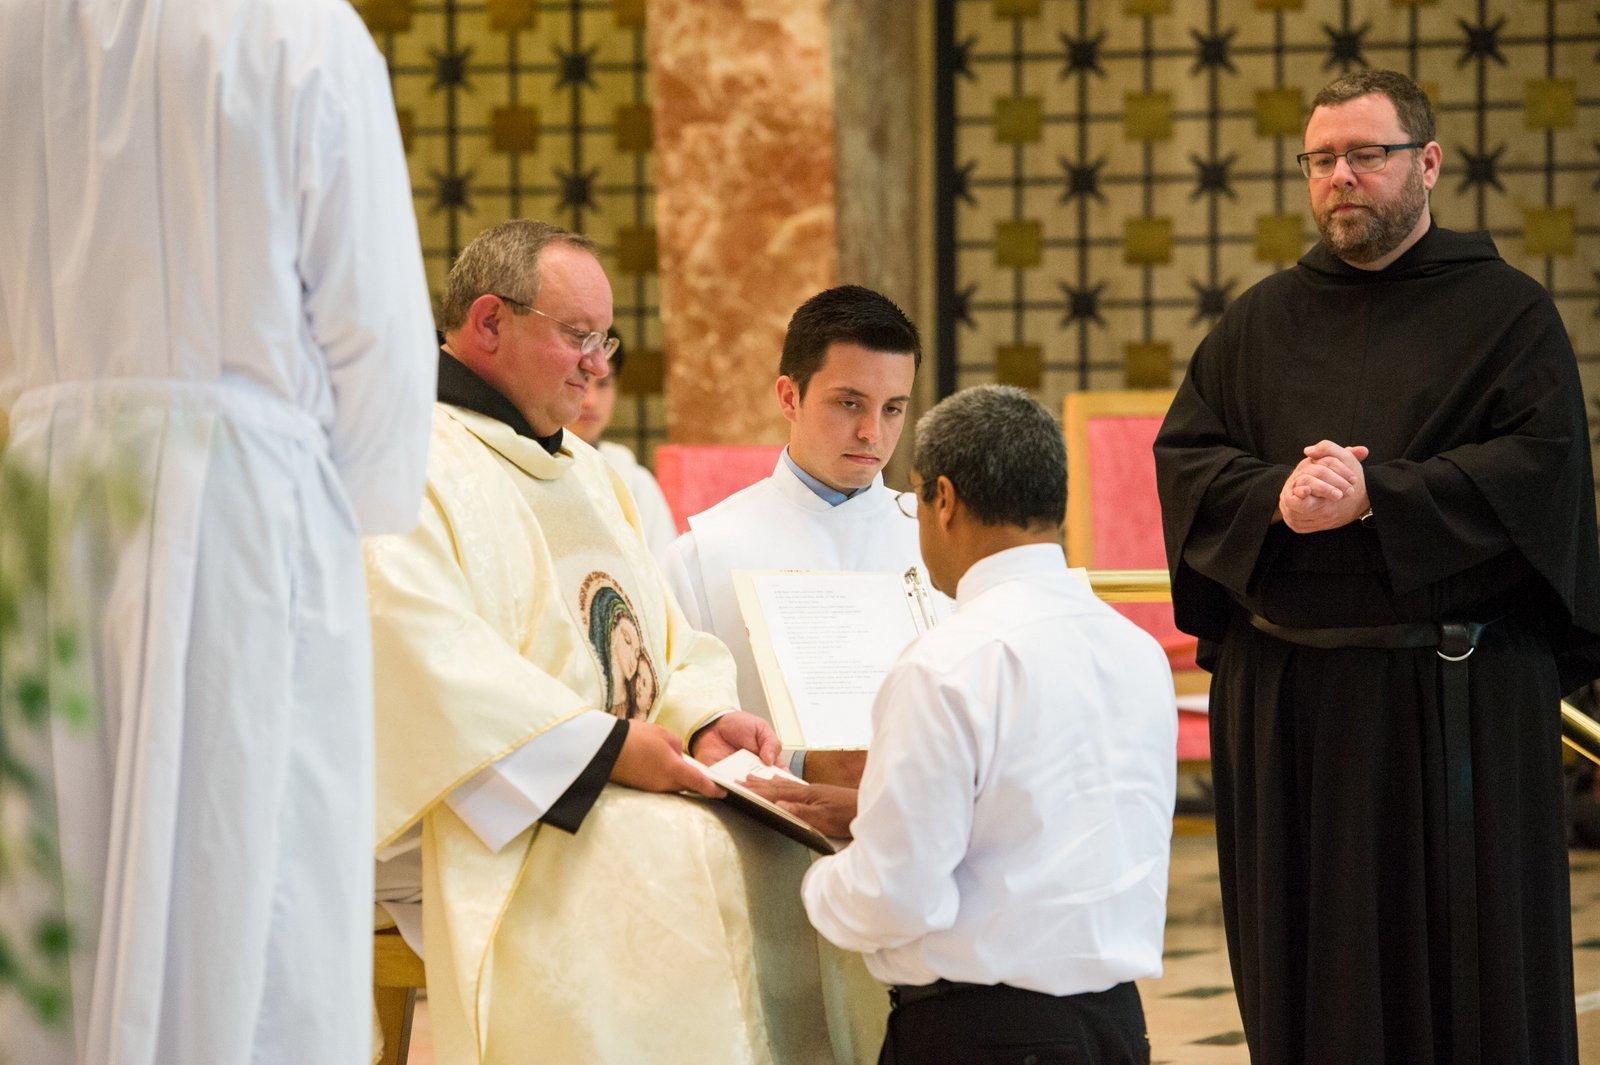 Fr. Joseph Broudou professes his first vows